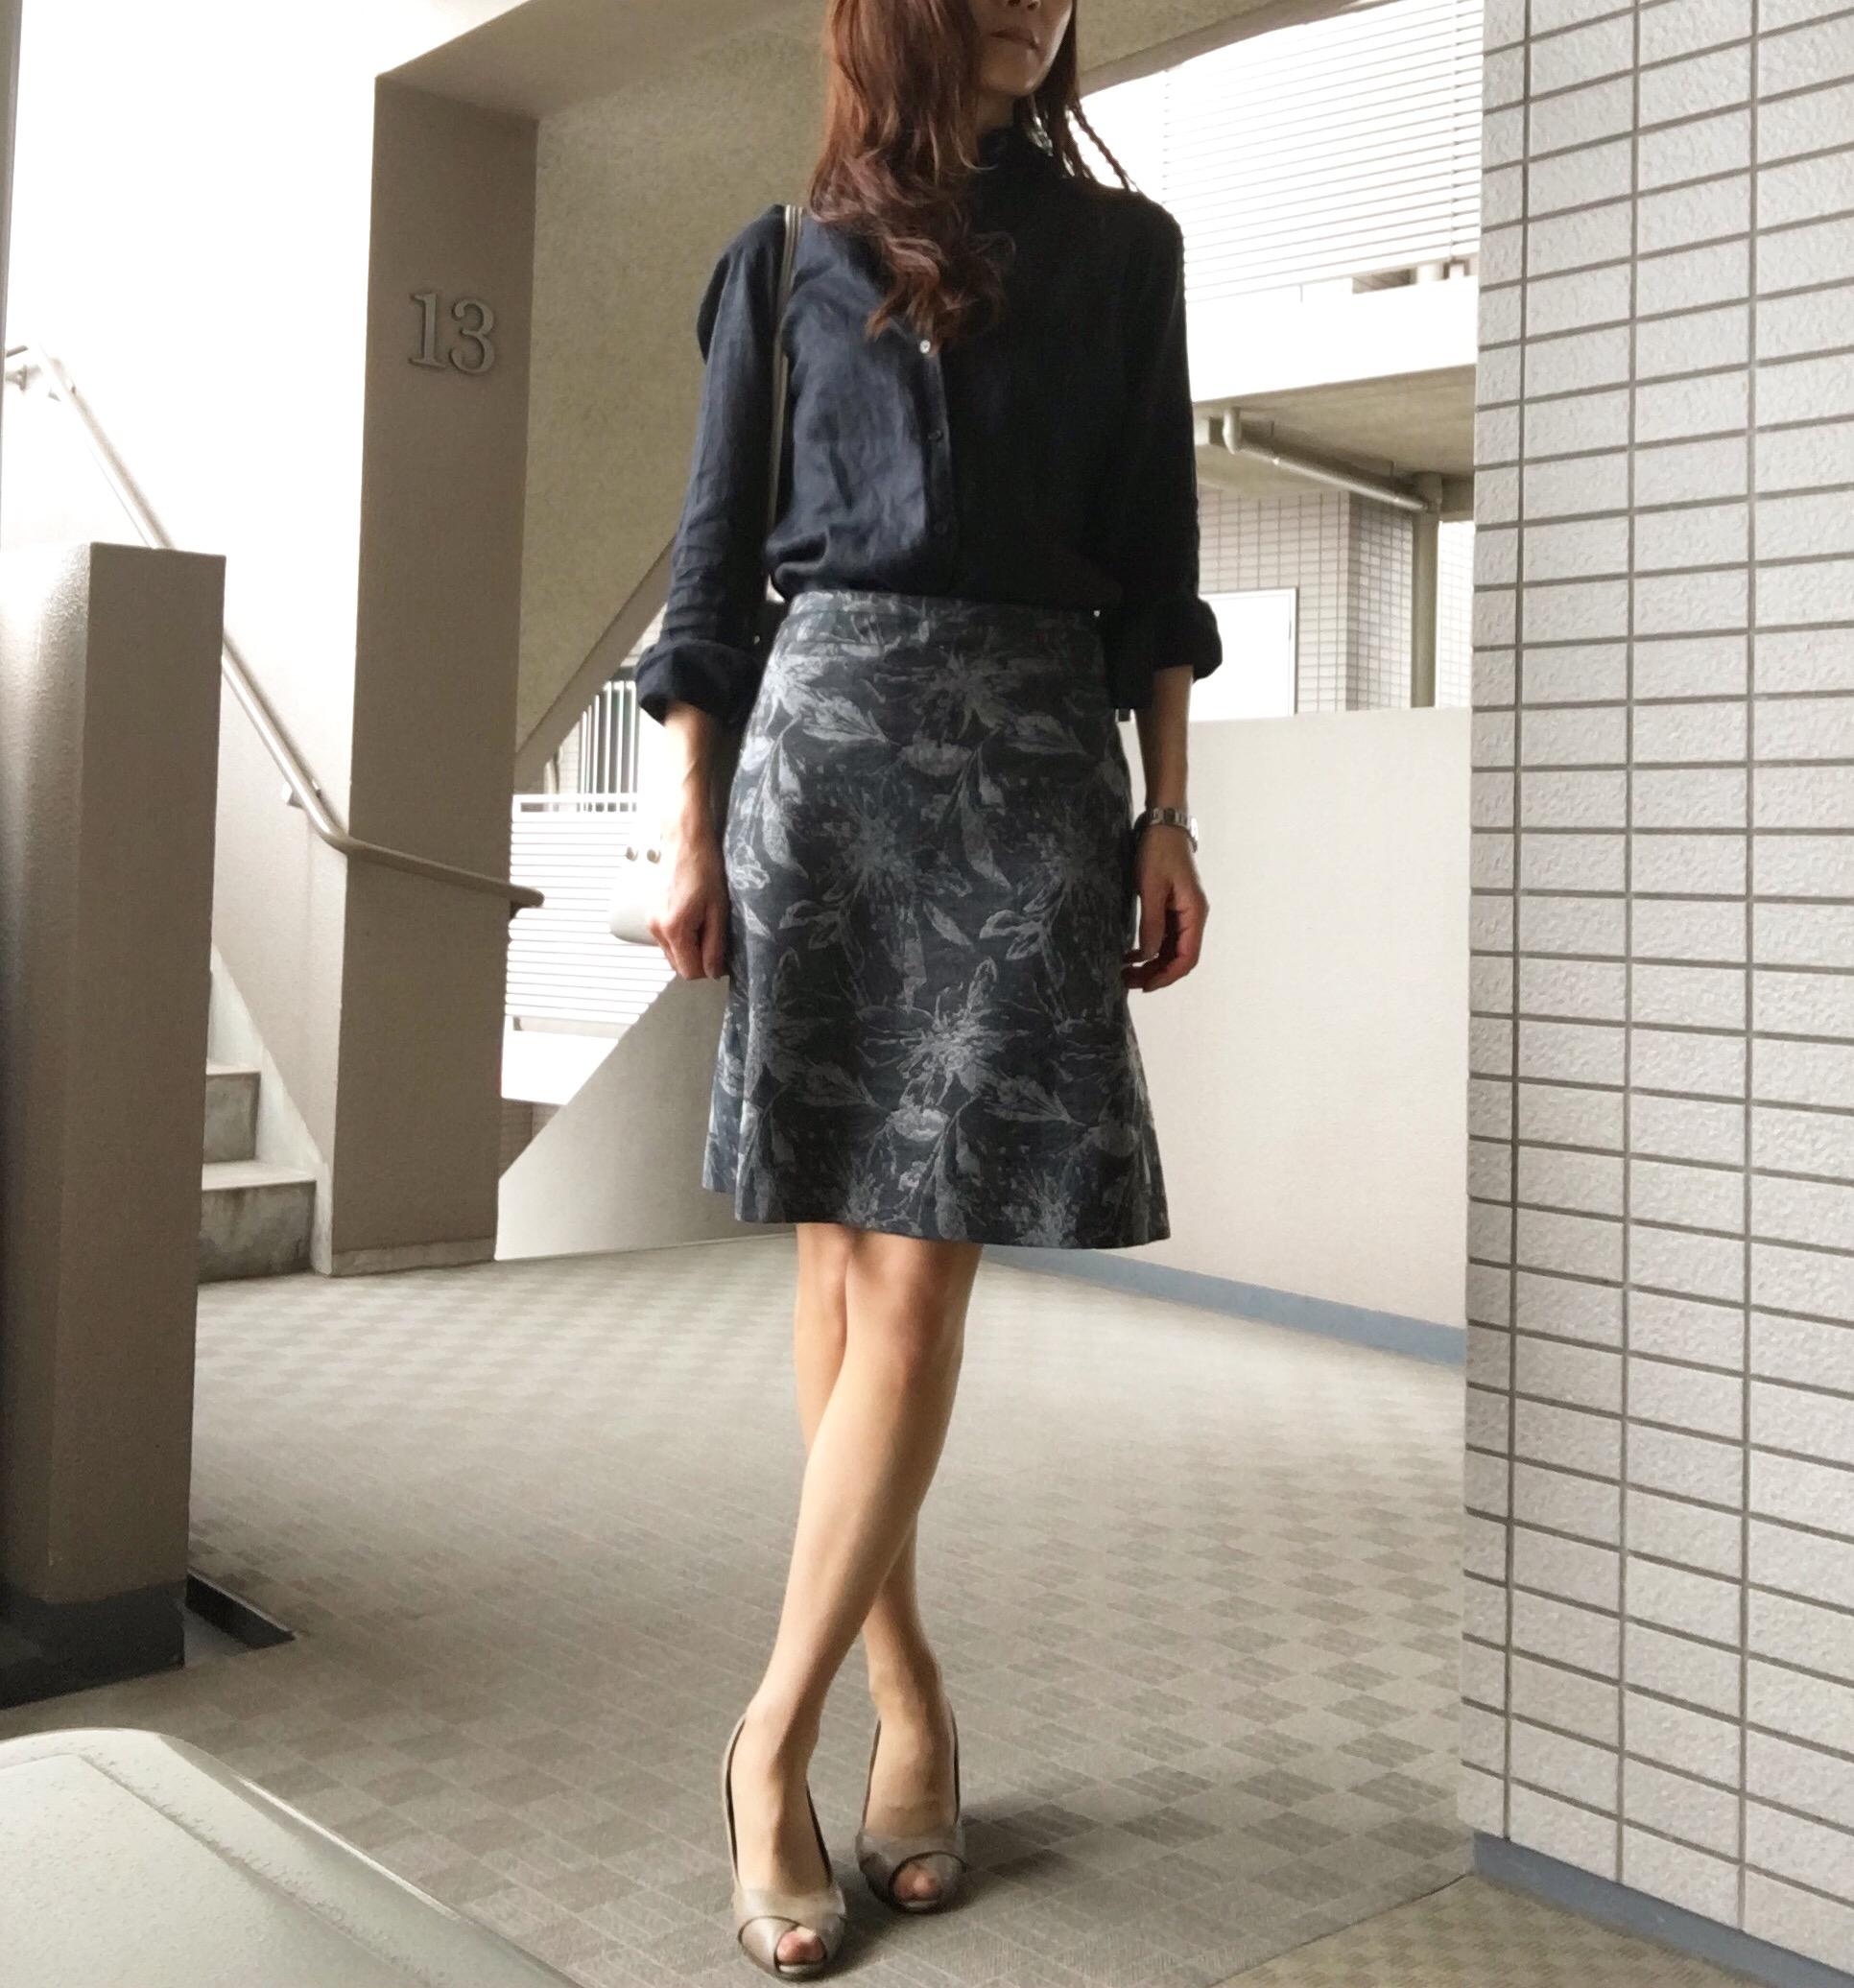 chiyominさんの投稿 – (705970)